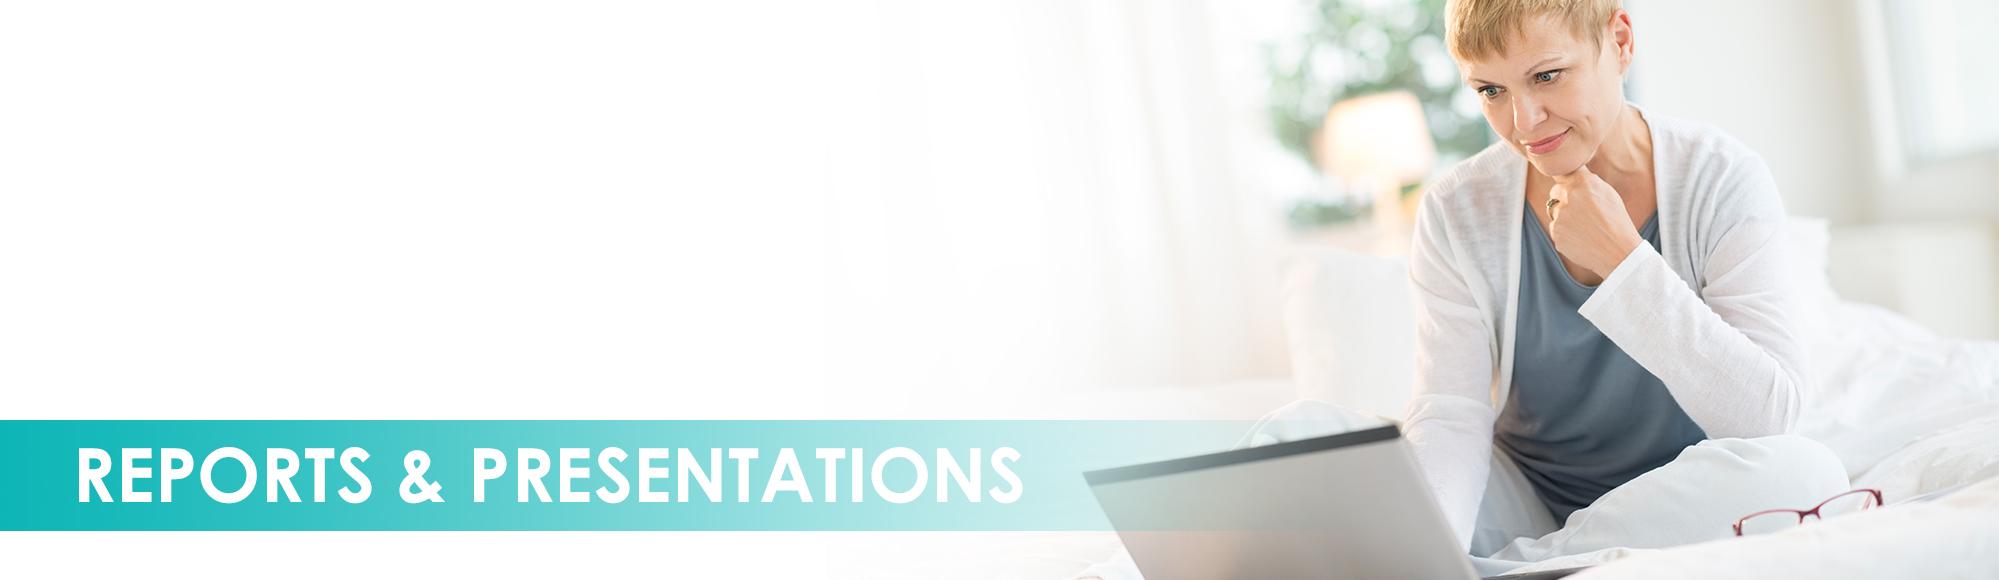 cf_reports-presentations_banner